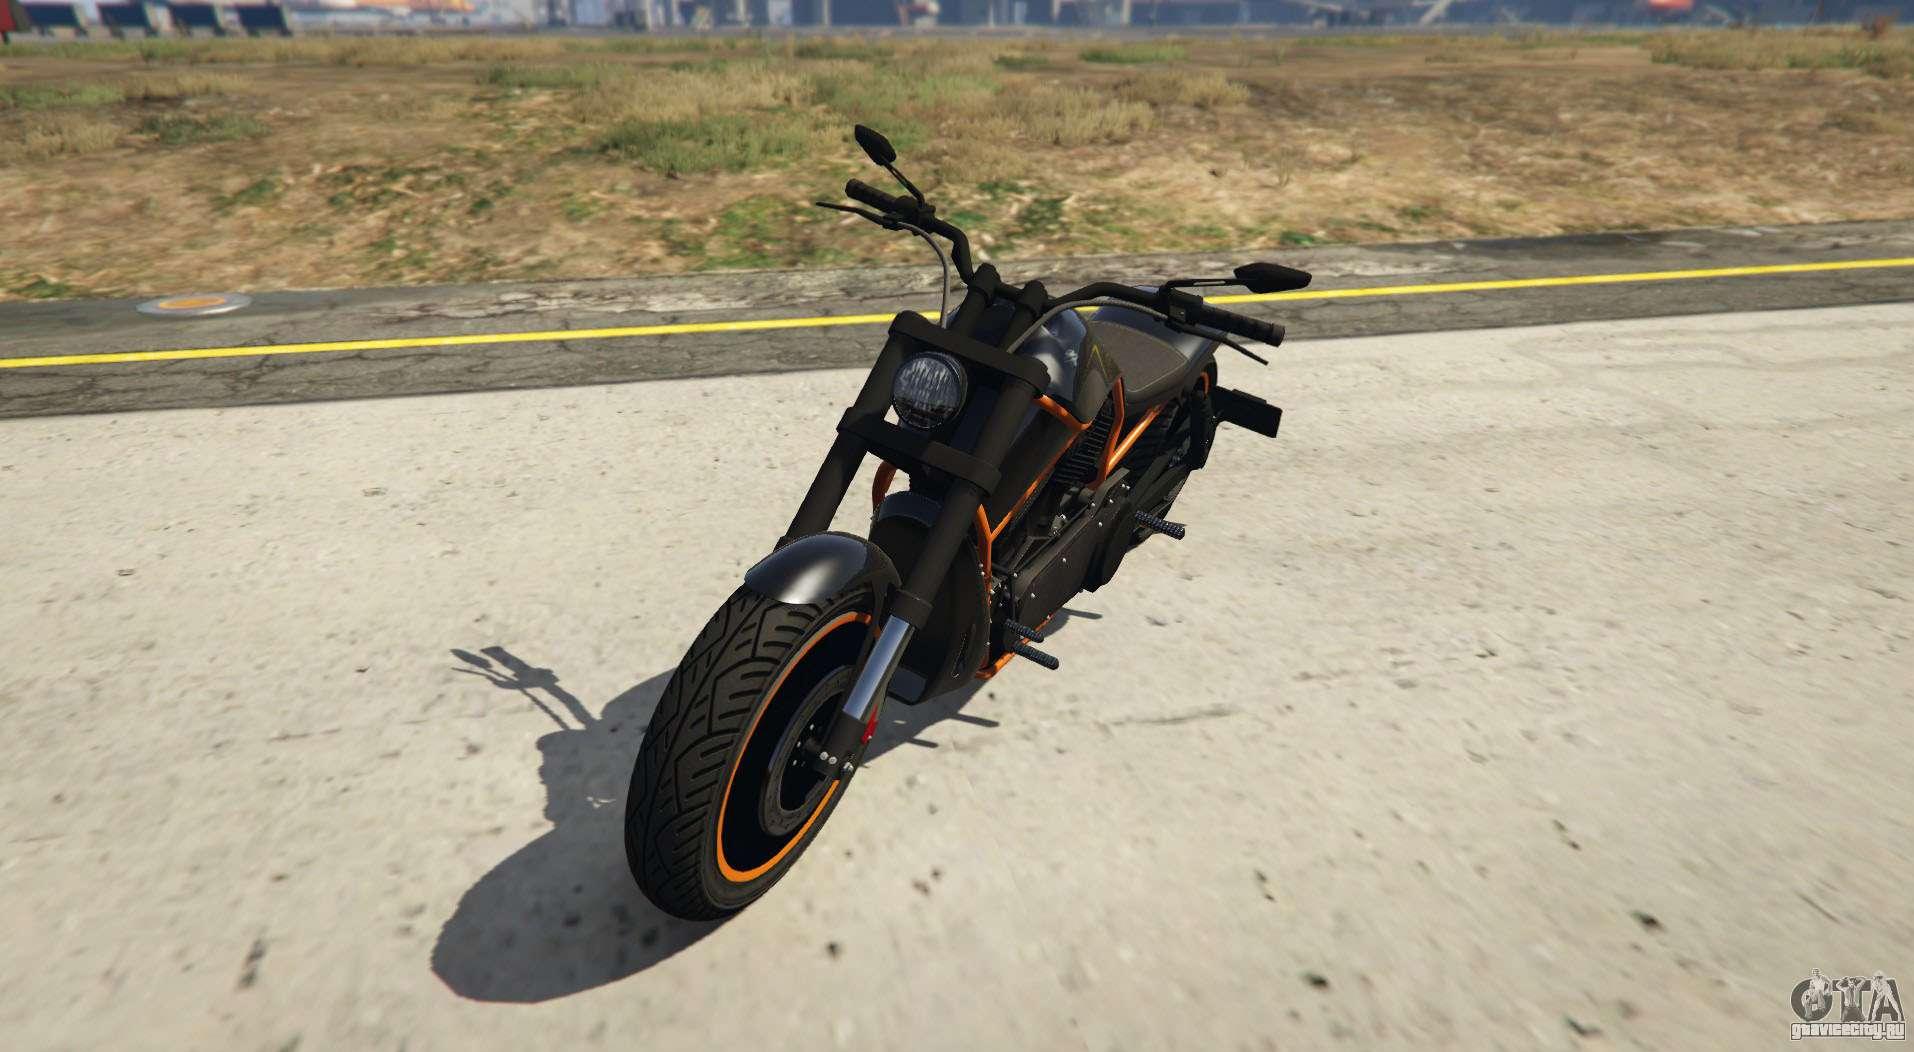 Стильный The Western Motorcycle Company Nightblade